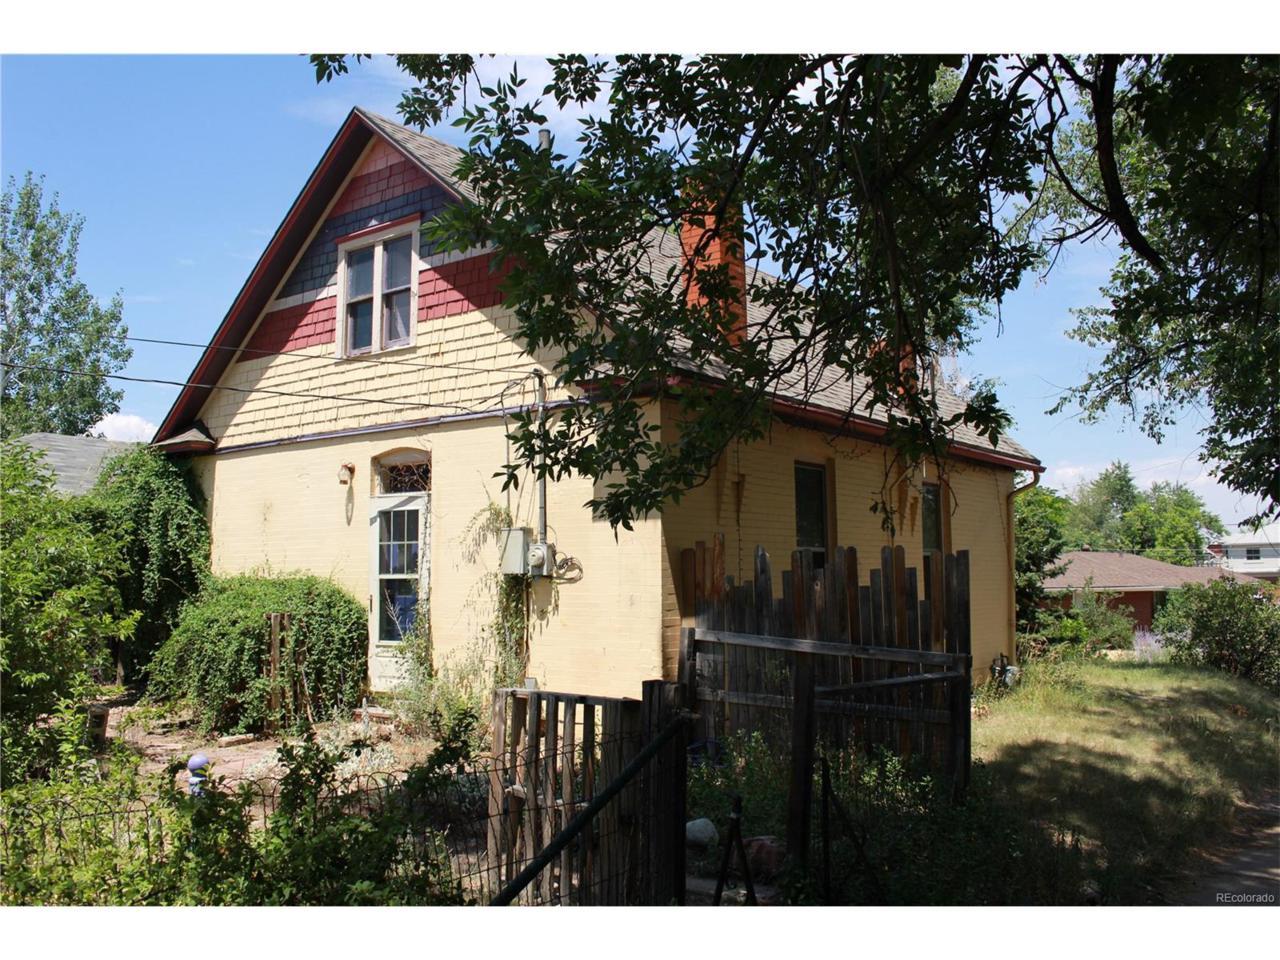 4600 W 35th Avenue, Denver, CO 80212 (MLS #9503242) :: 8z Real Estate